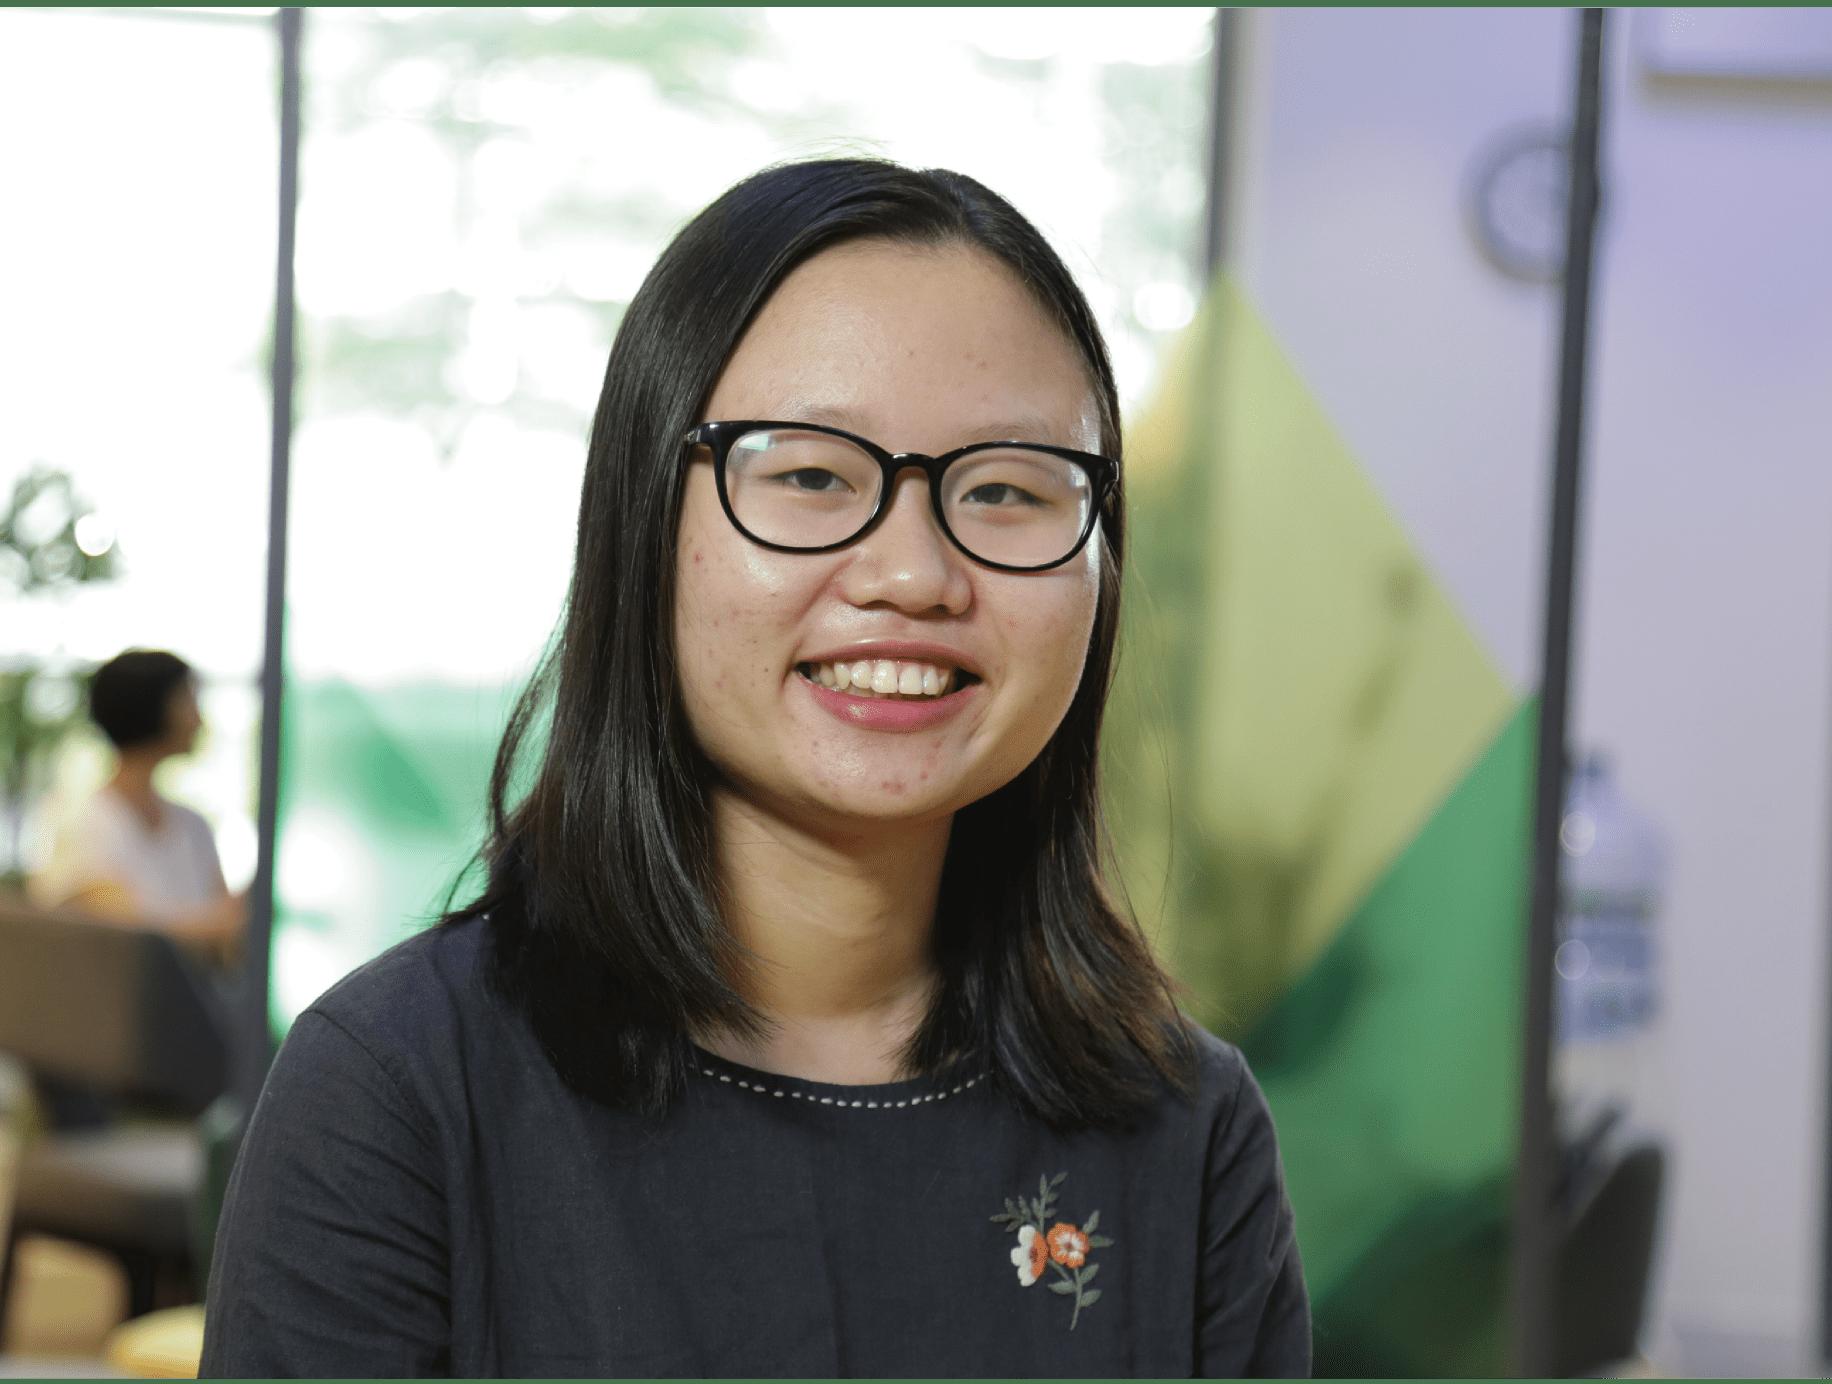 Nguyen Mai Kieu Anh